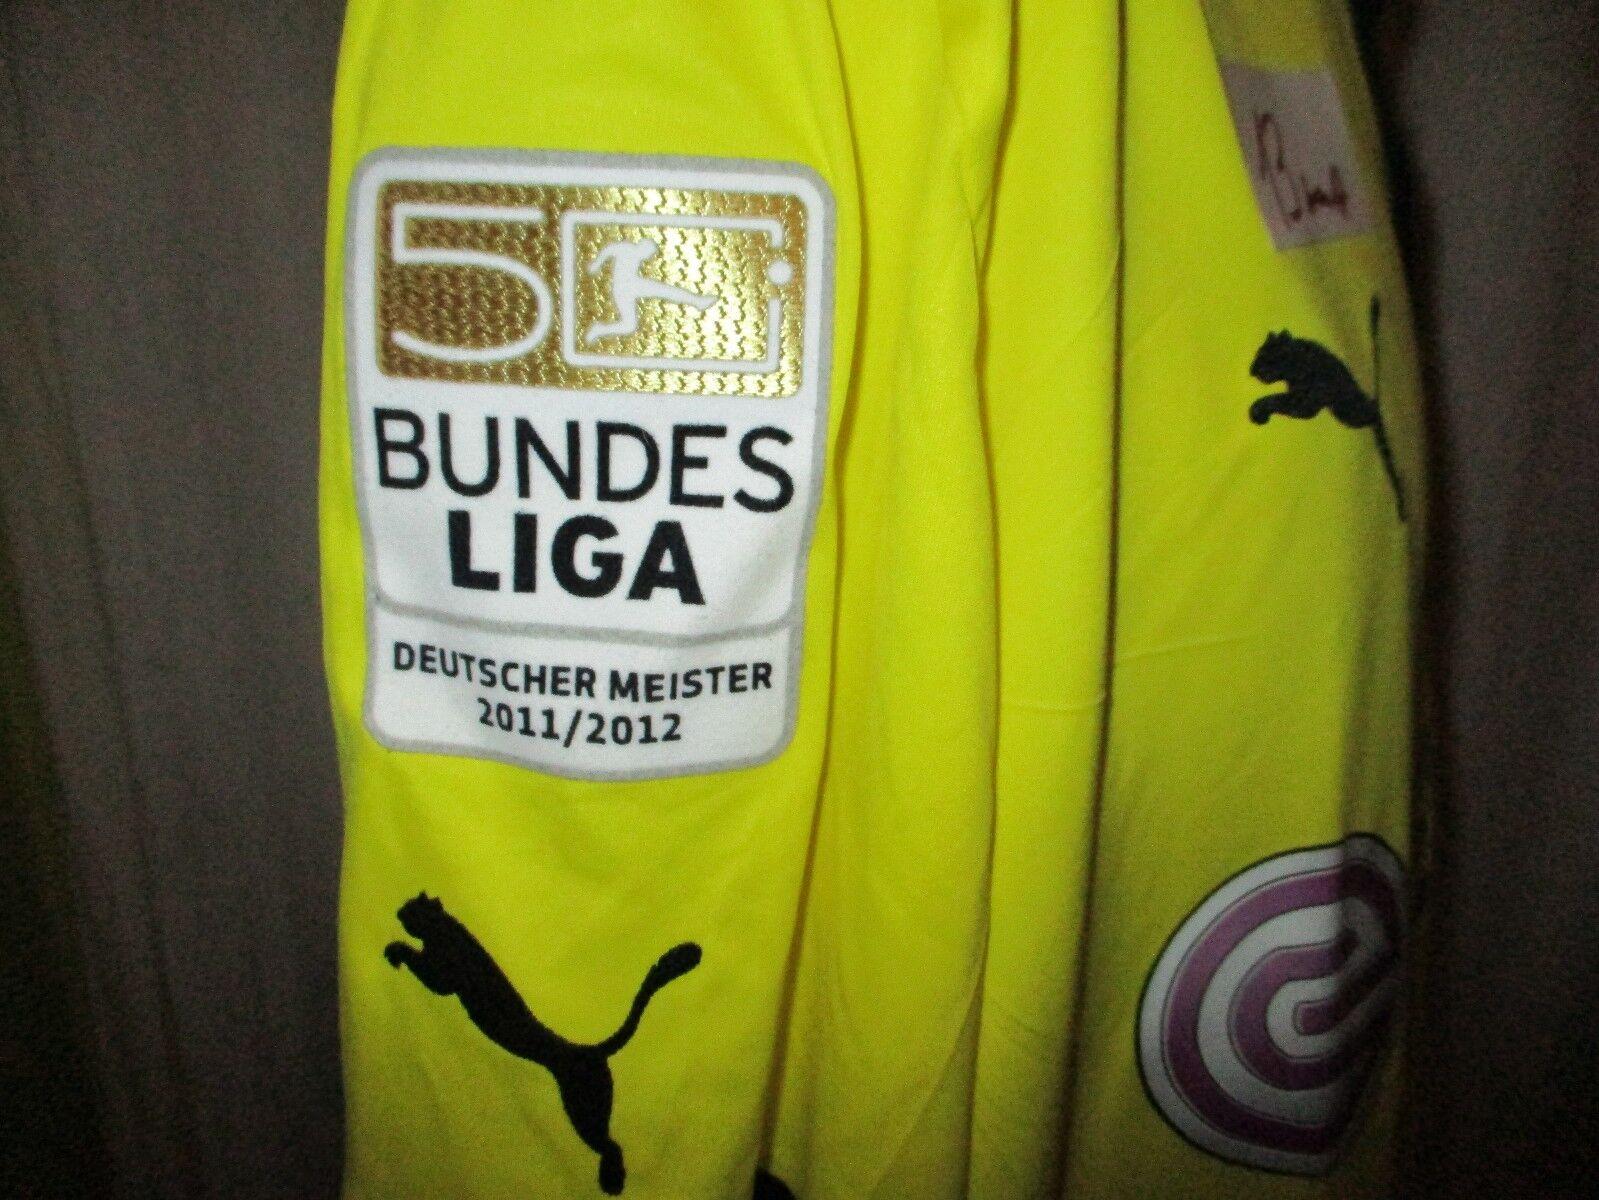 Borussia Trikot Dortmund Puma Heim Trikot Borussia 2012/13